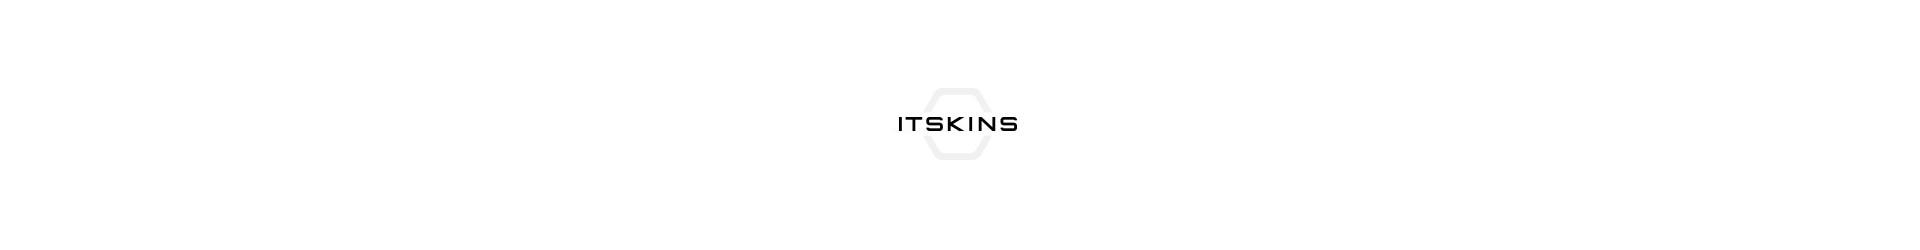 ITSKINS